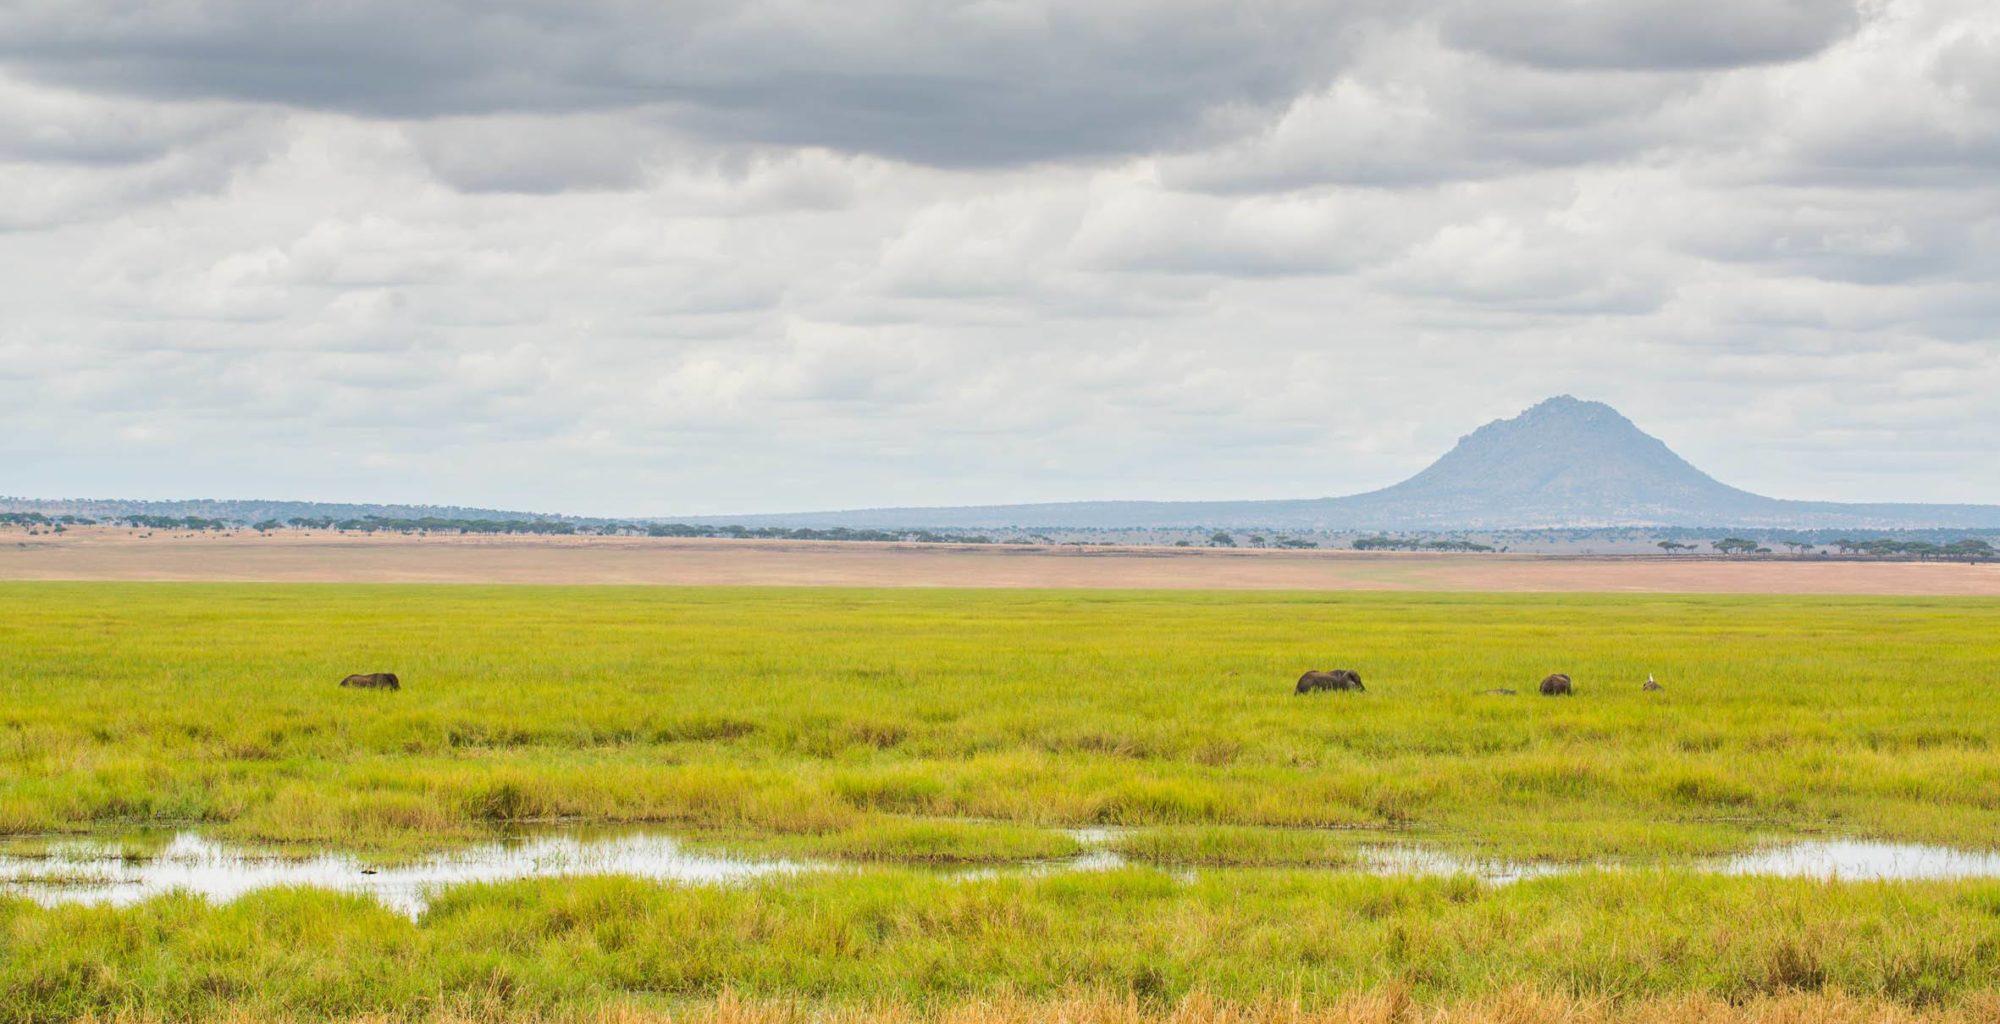 Tanzania-Tarangire-Landscape